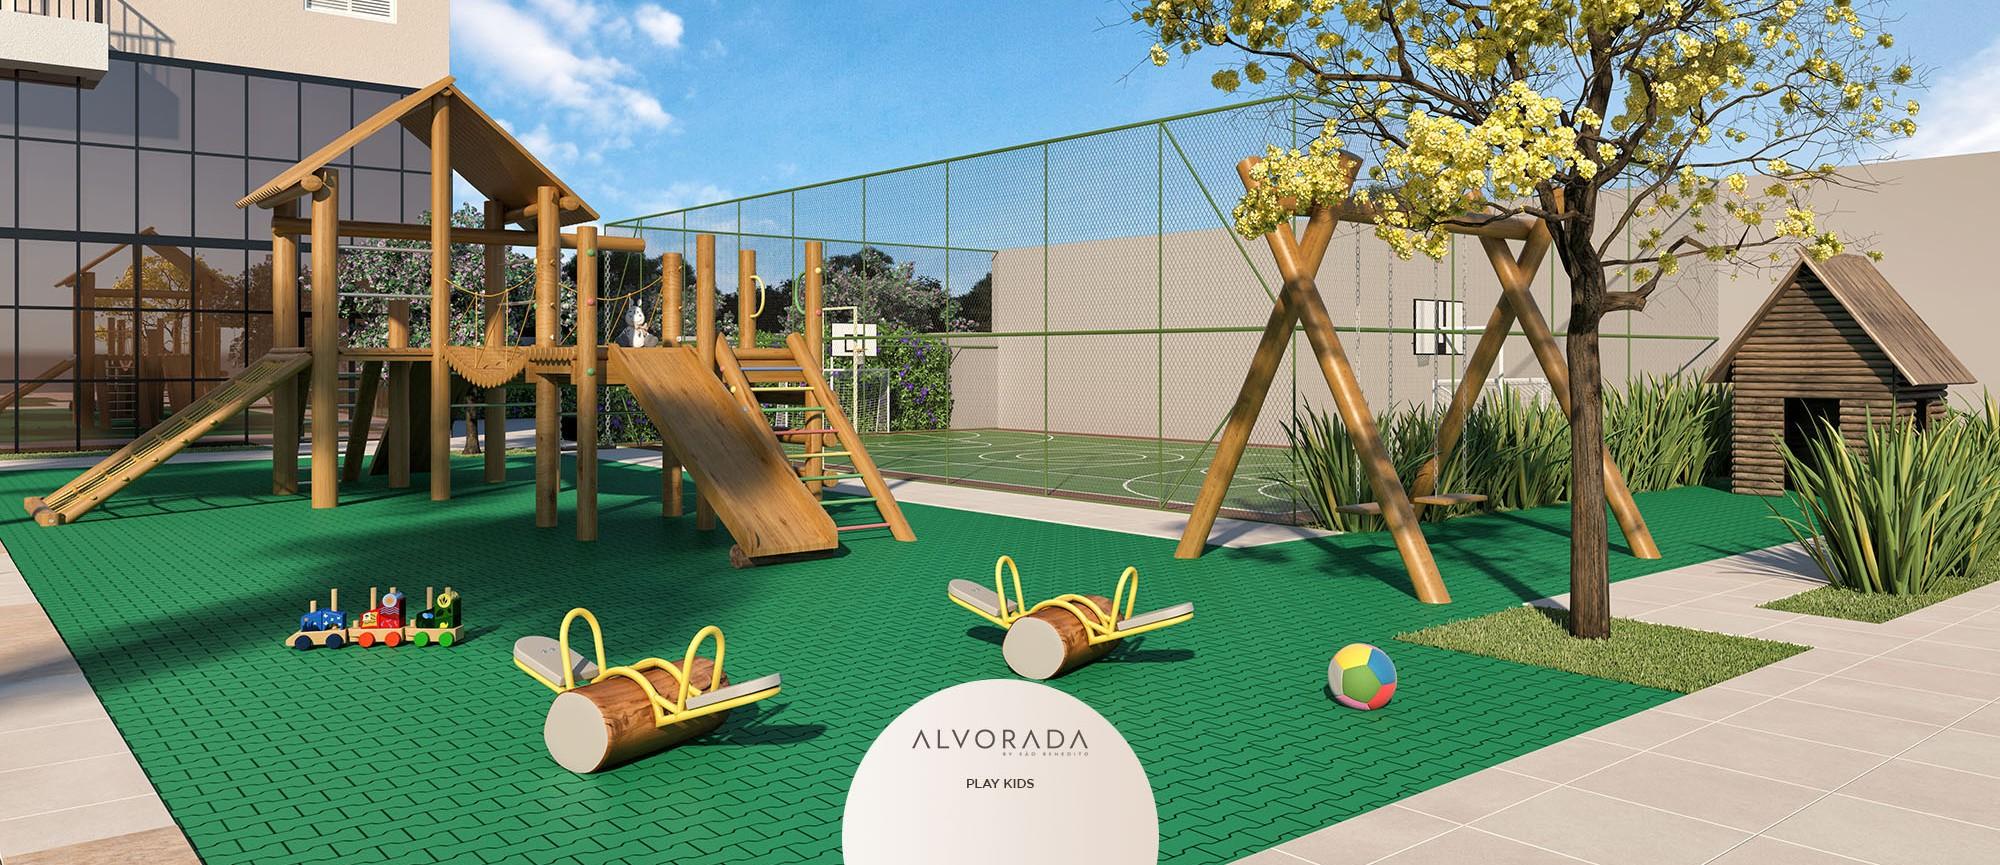 Playground Alvorada